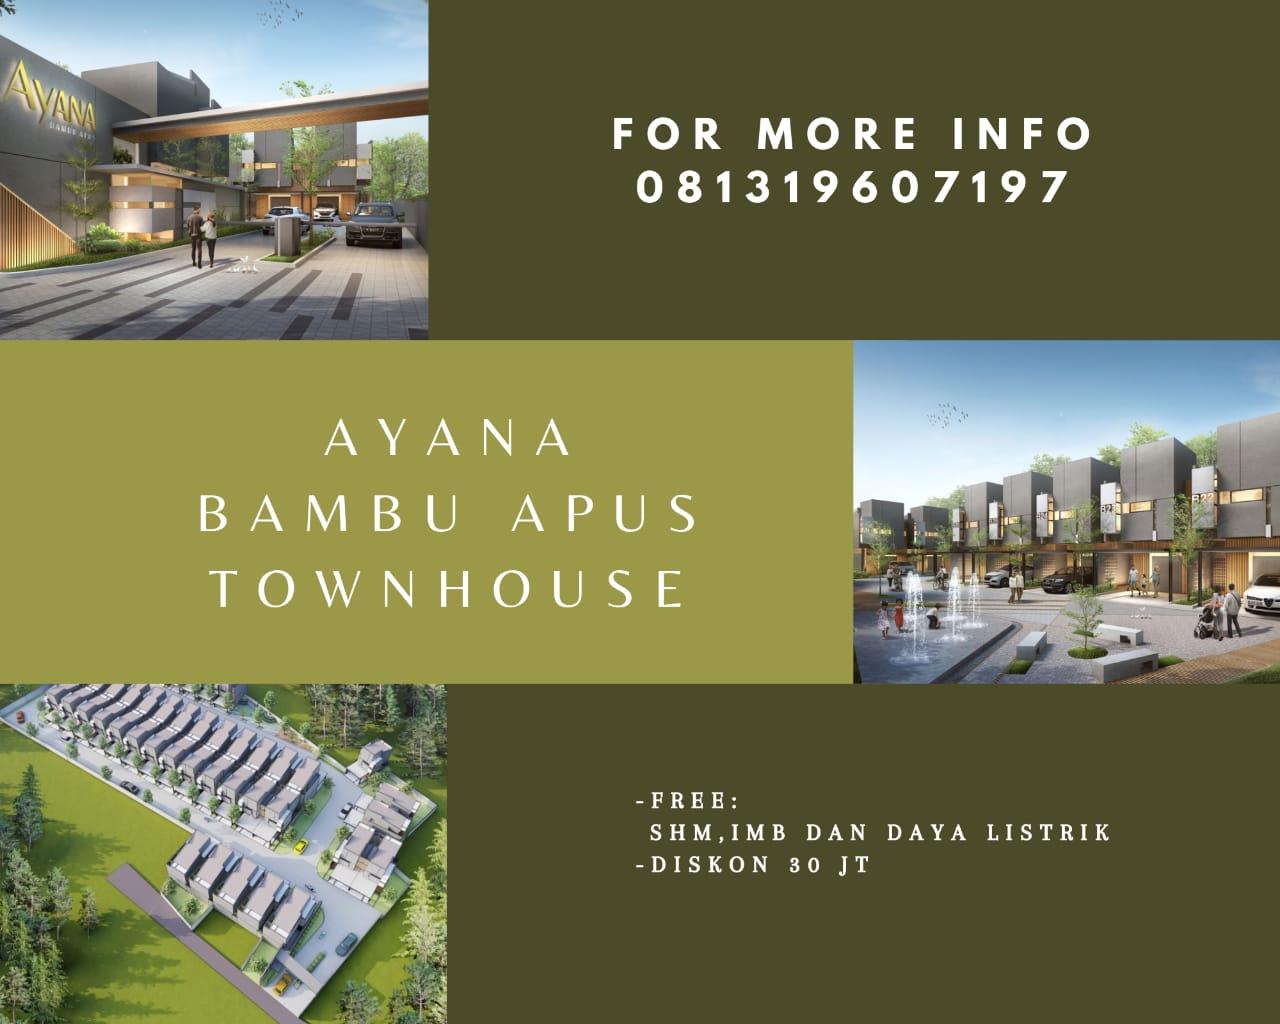 Promo Ayana Bambu Apus